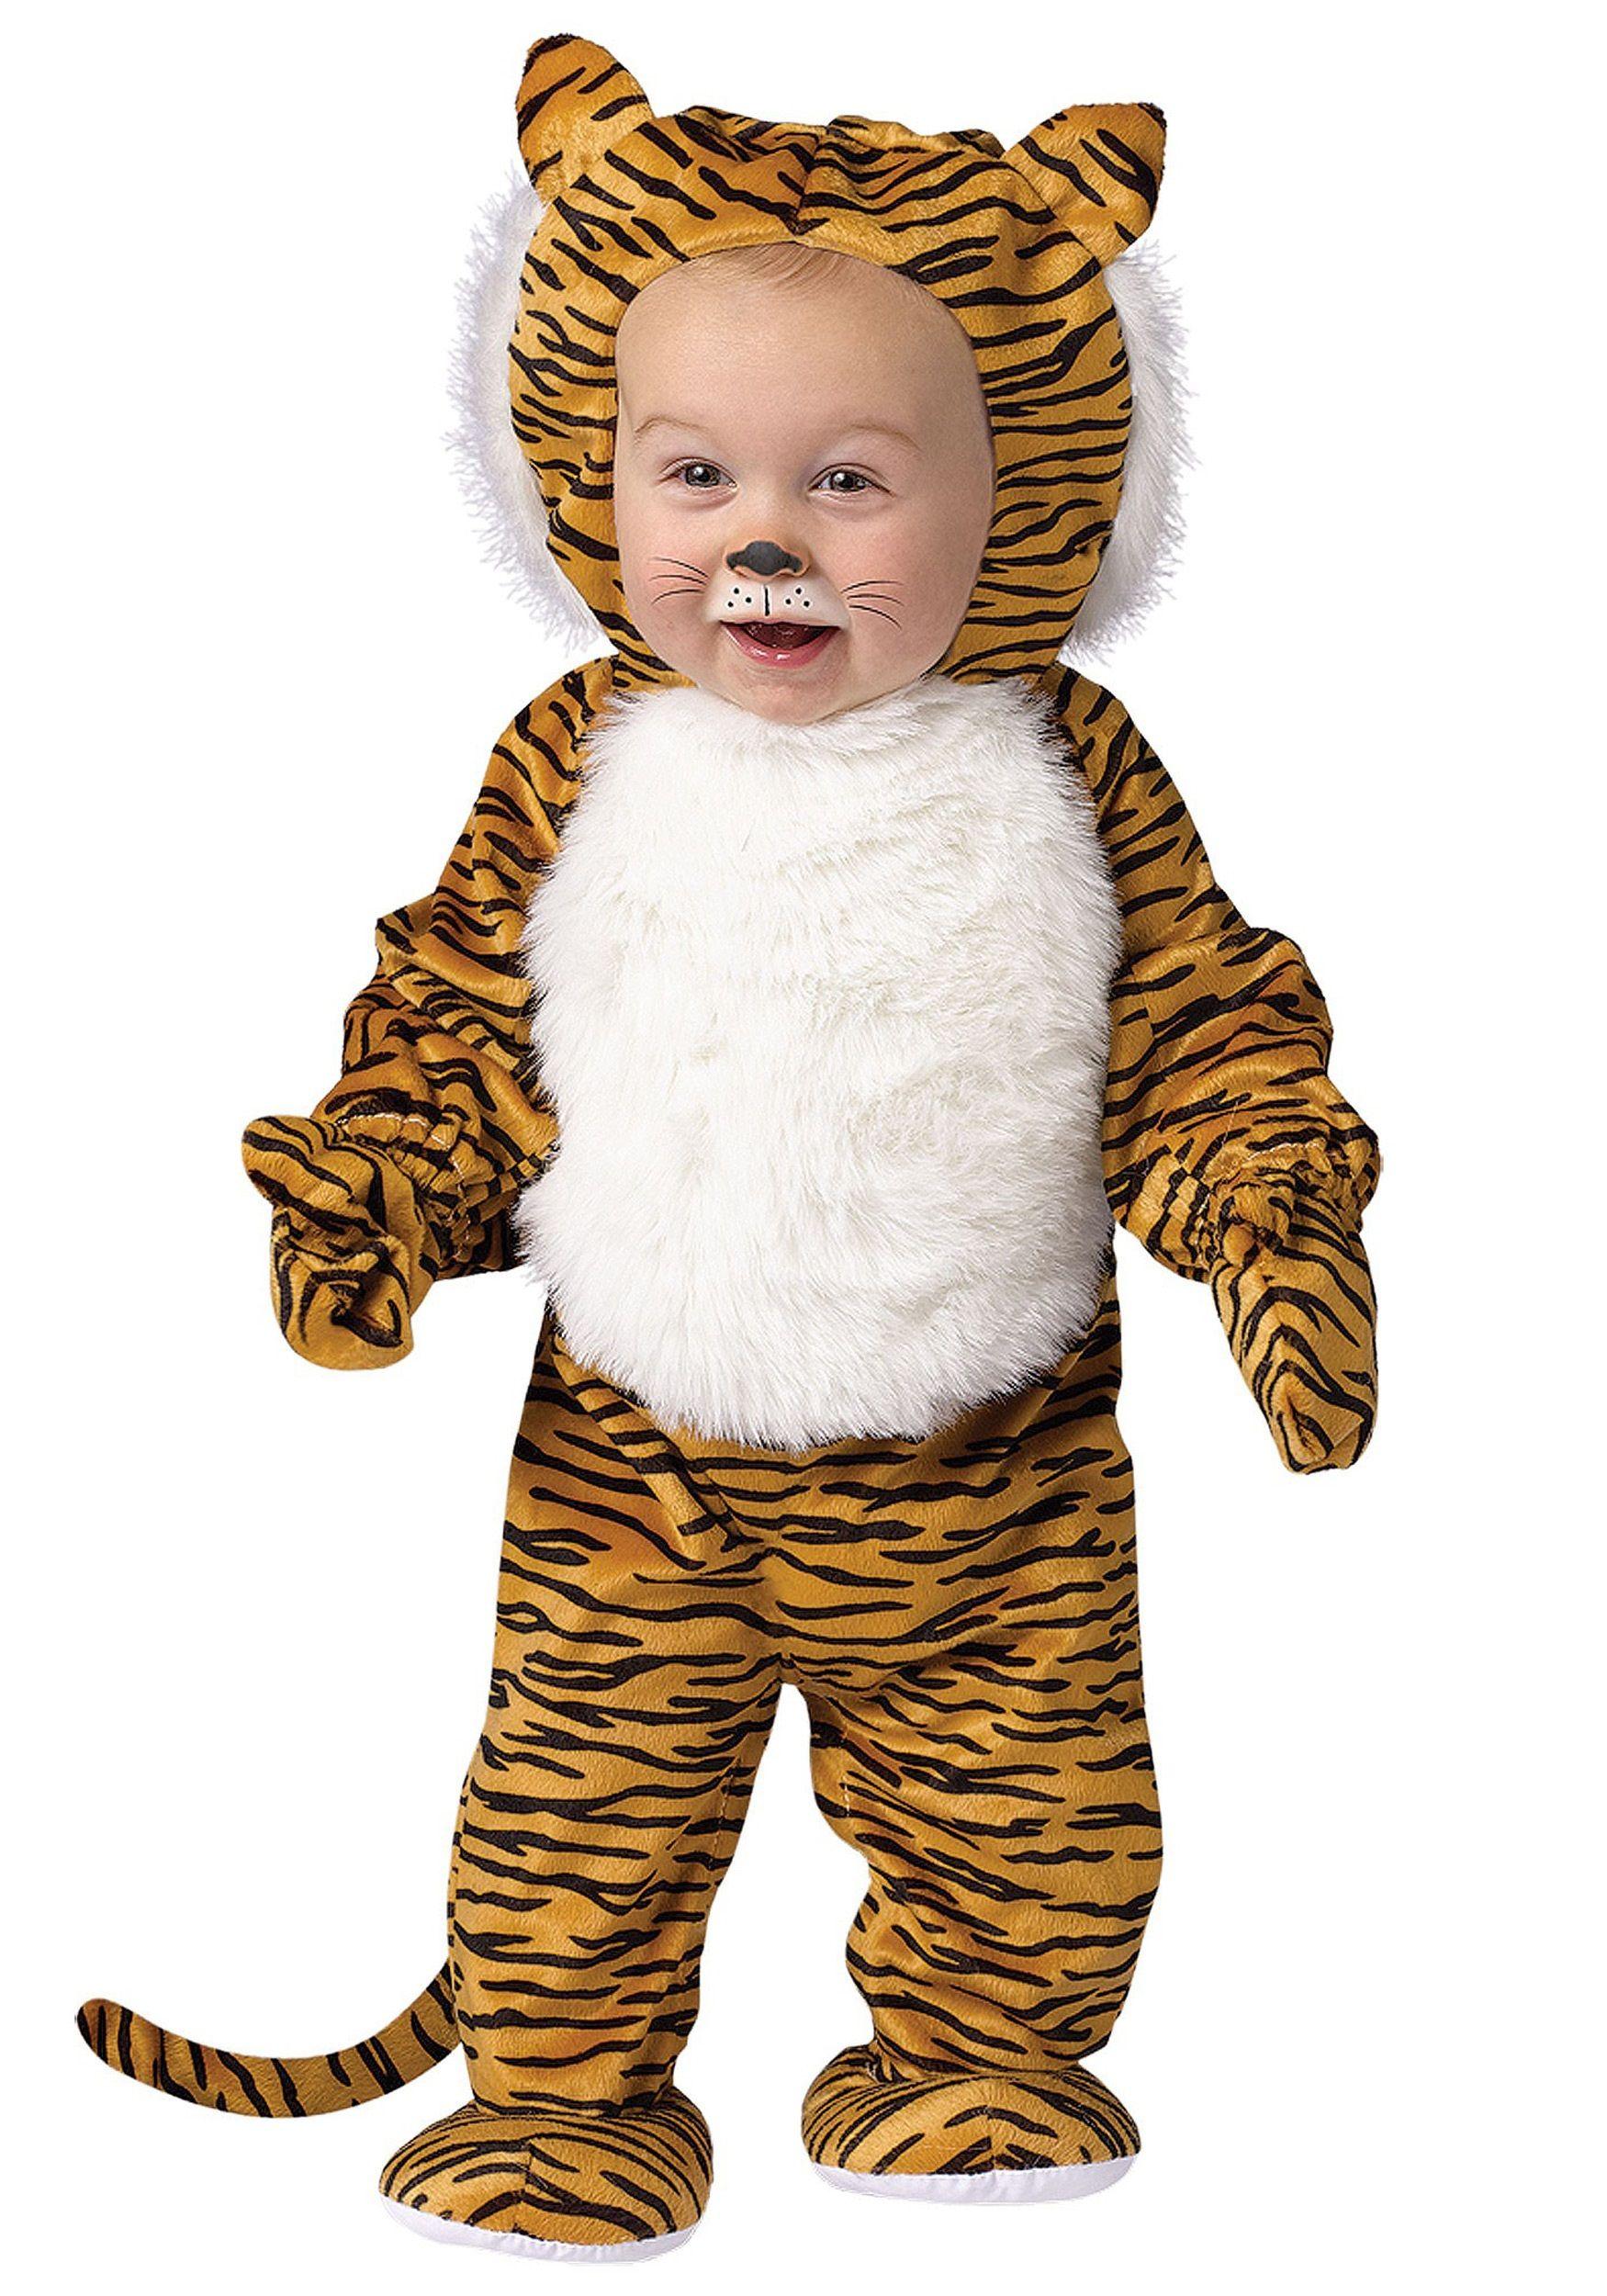 7f53dd7eb7745 Toddler Cuddly Tiger Costume